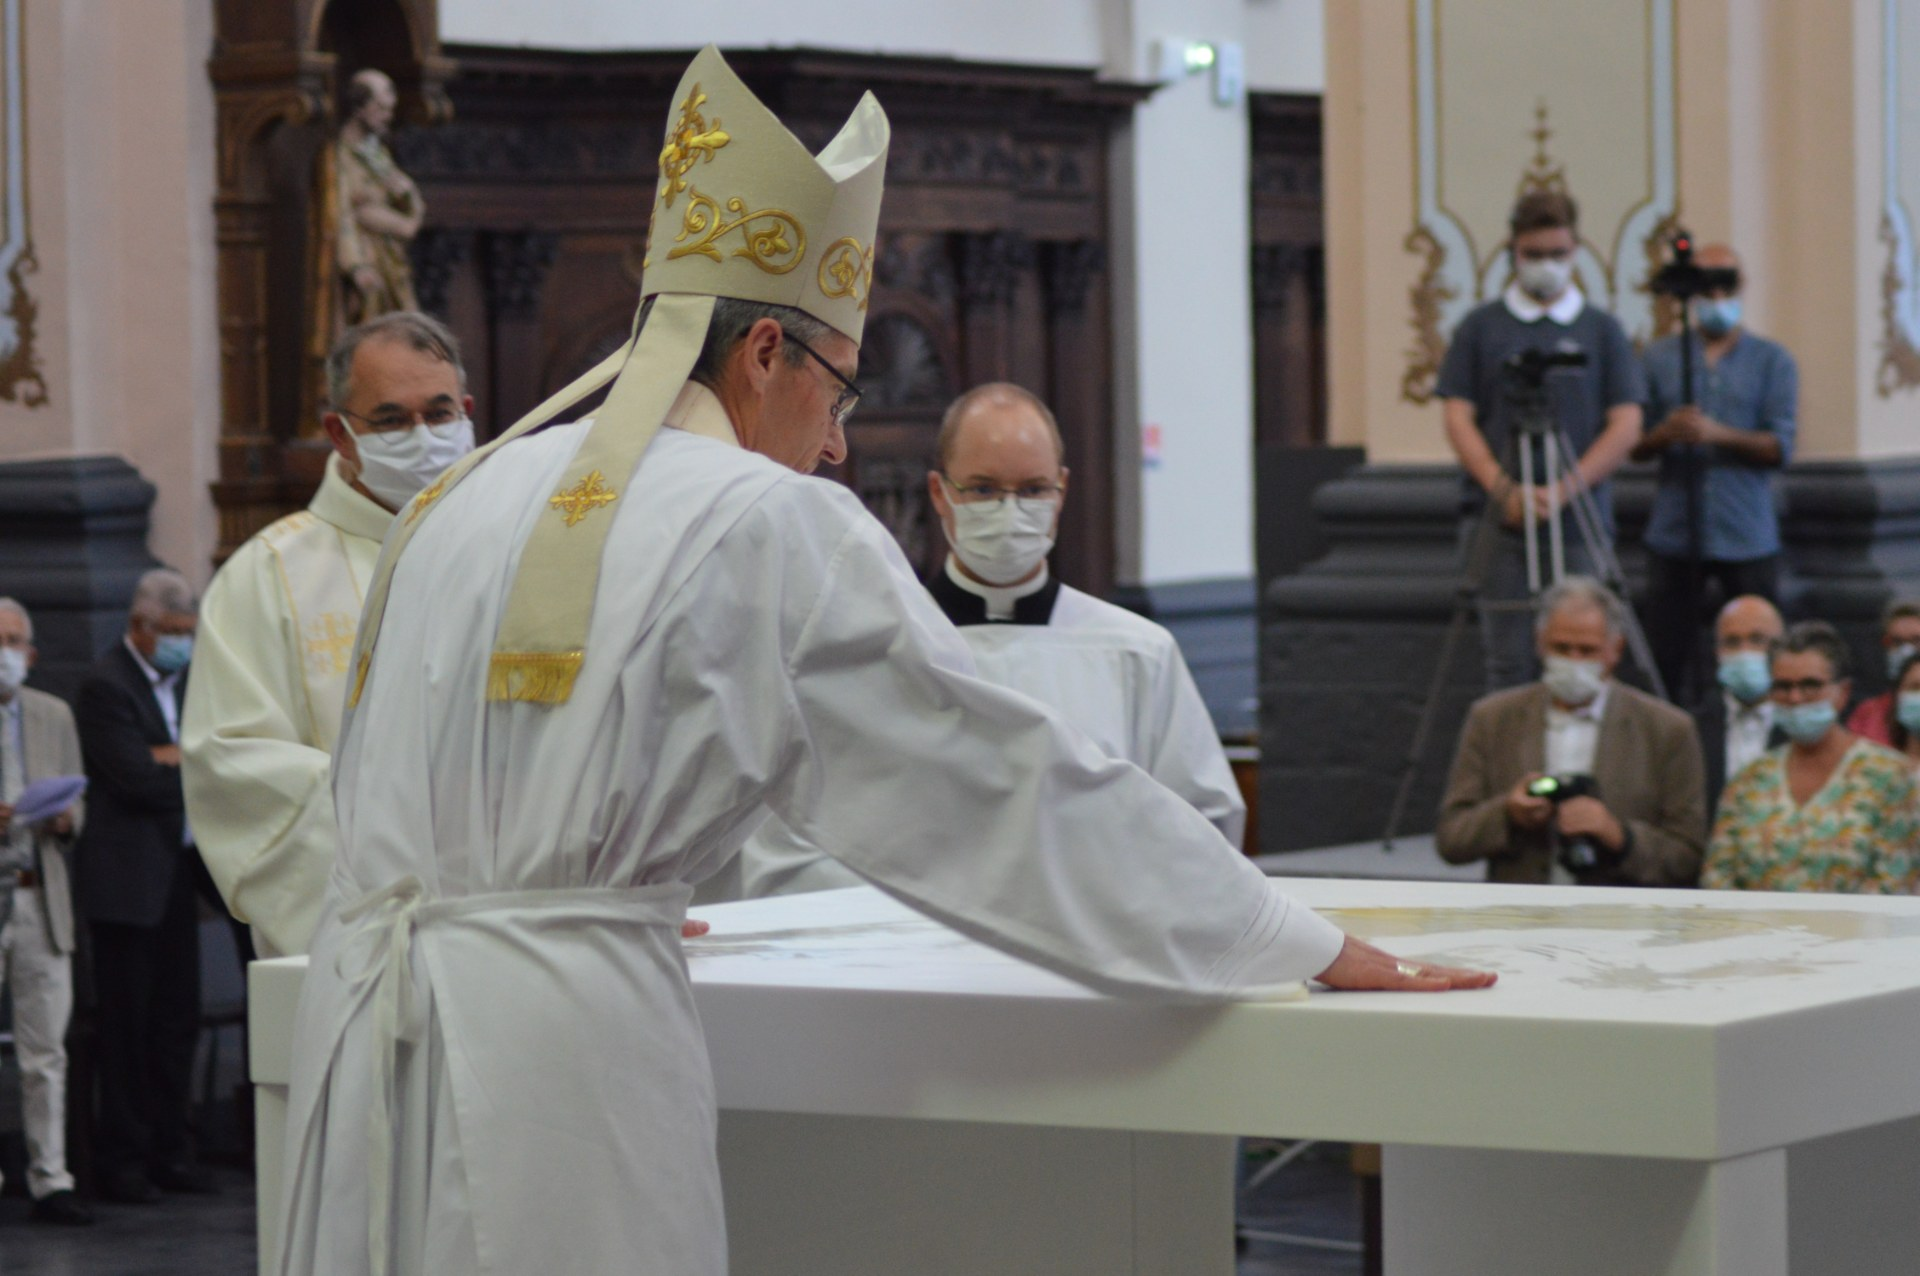 église st martin st amand 110921 13